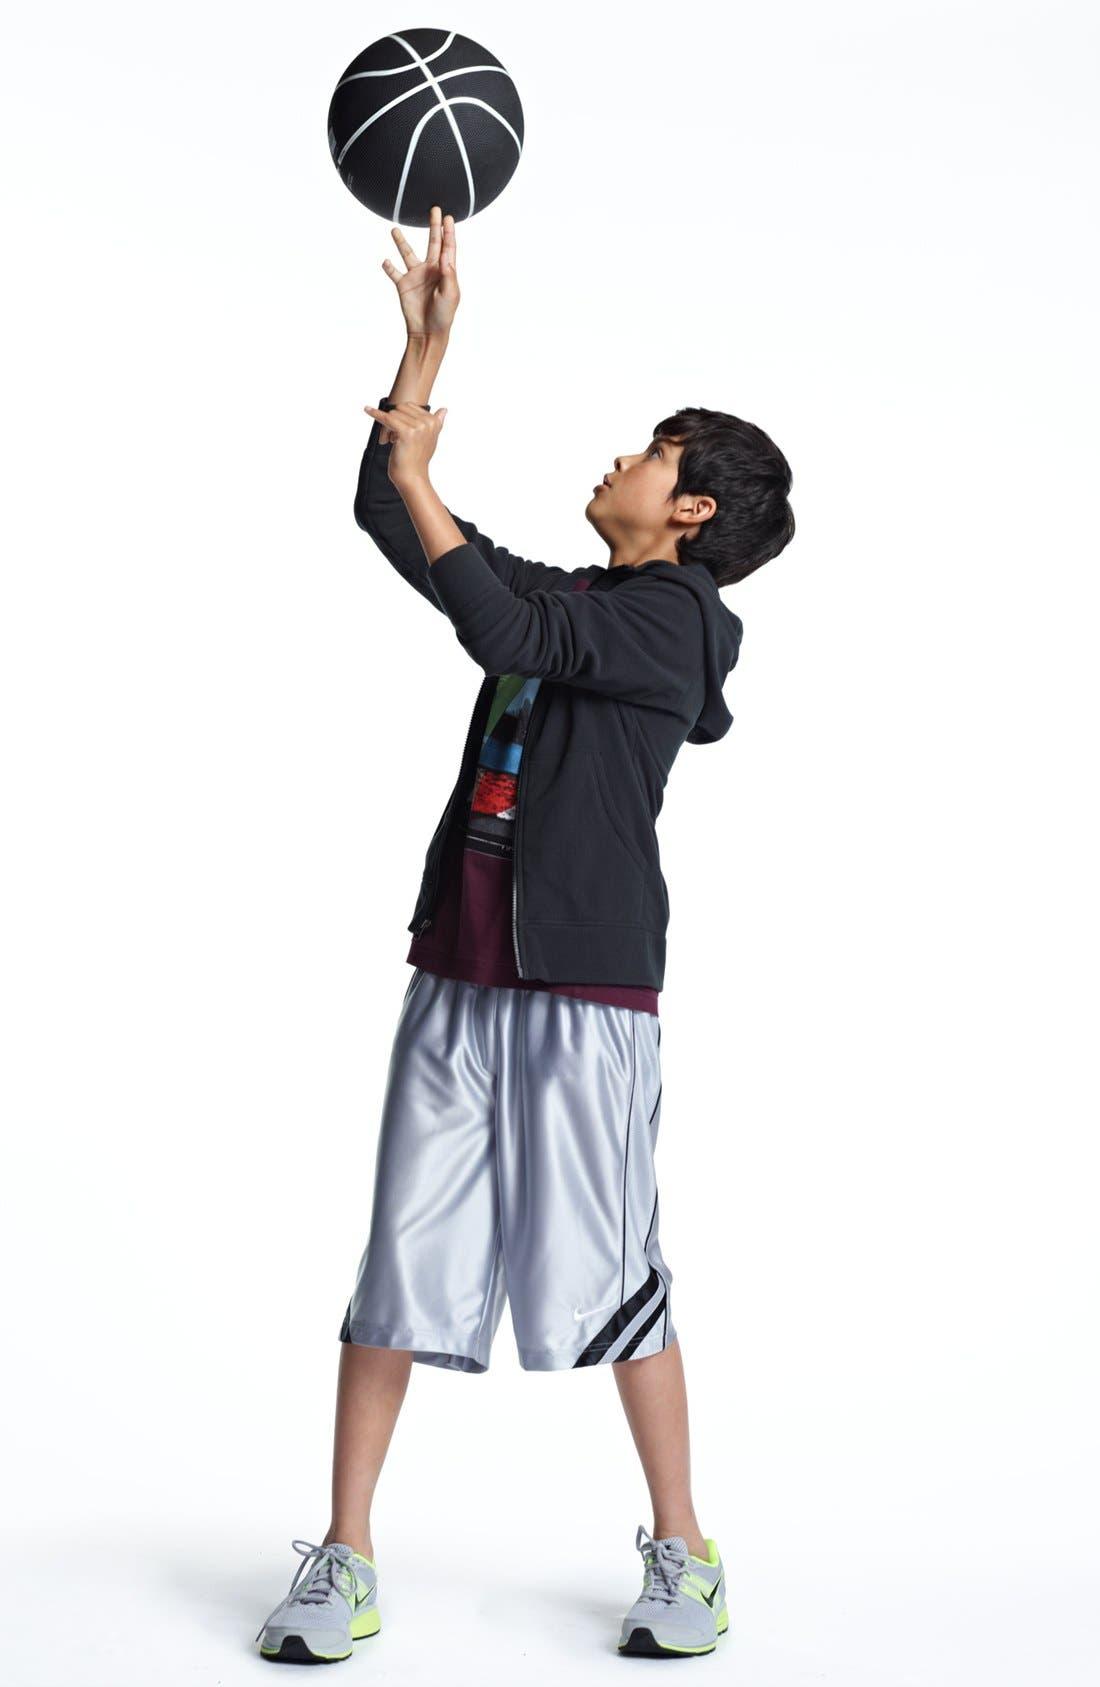 Alternate Image 1 Selected - Quiksilver T-Shirt & Nike Shorts (Big Boys)